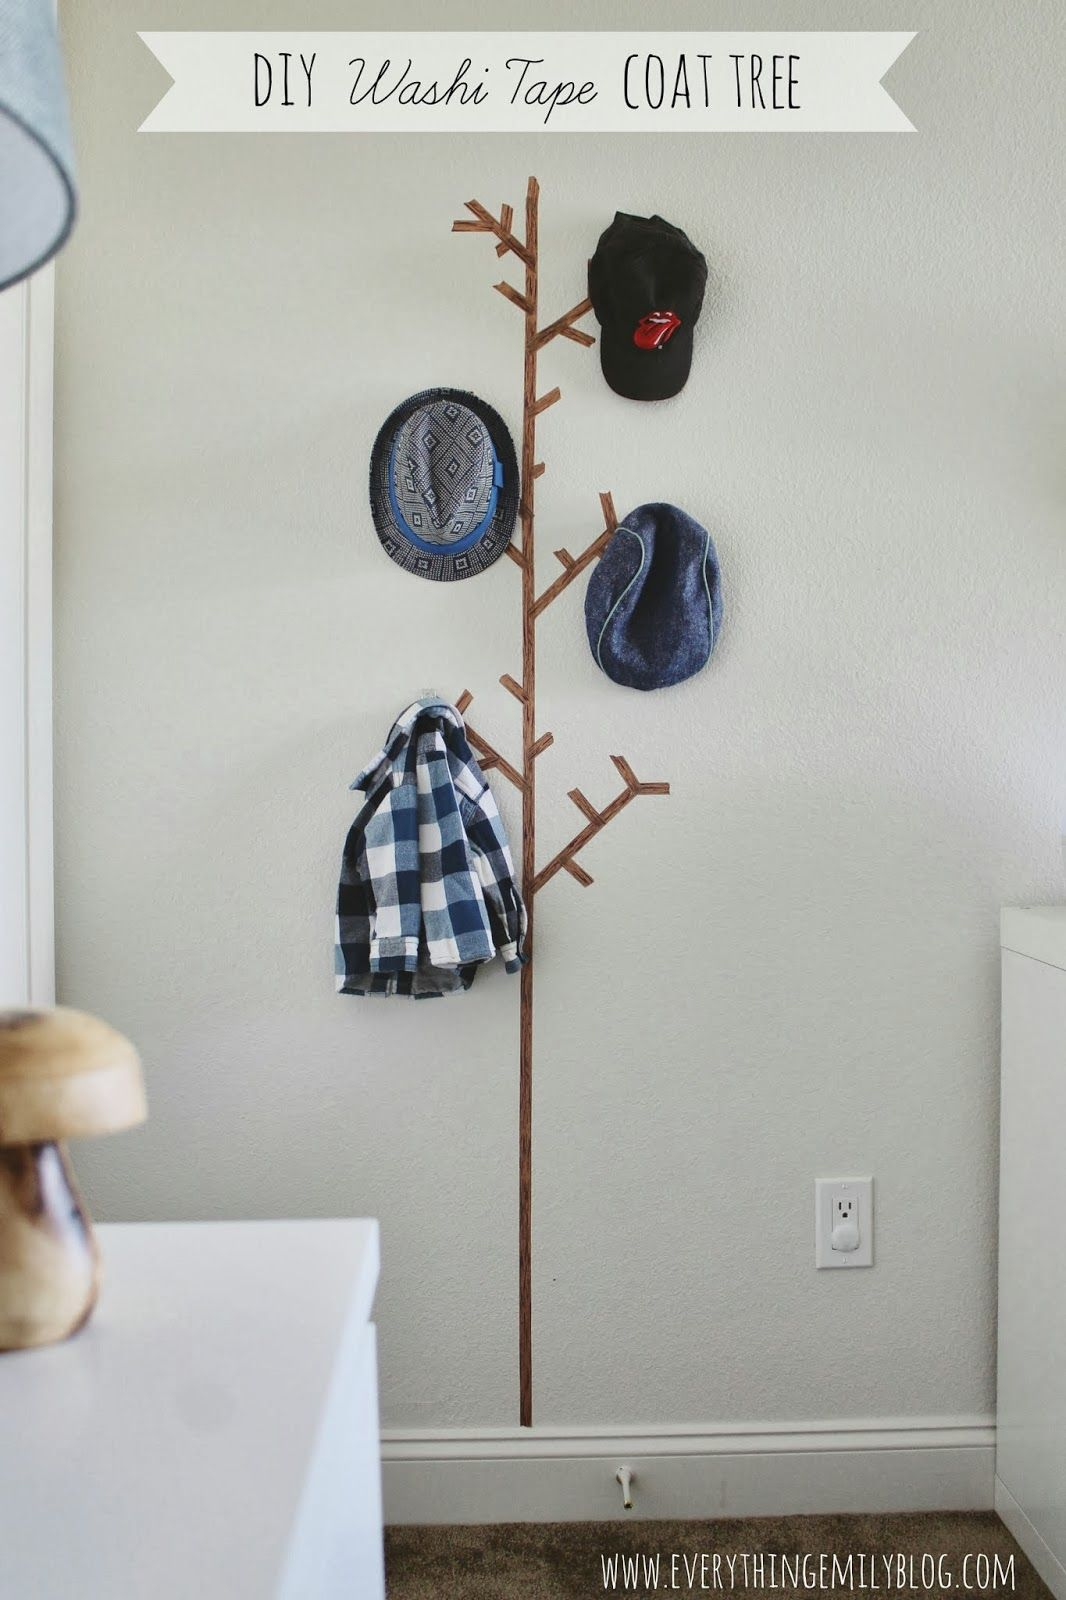 Everything Emily: DIY Washi Tape Coat Tree... | decoración ...